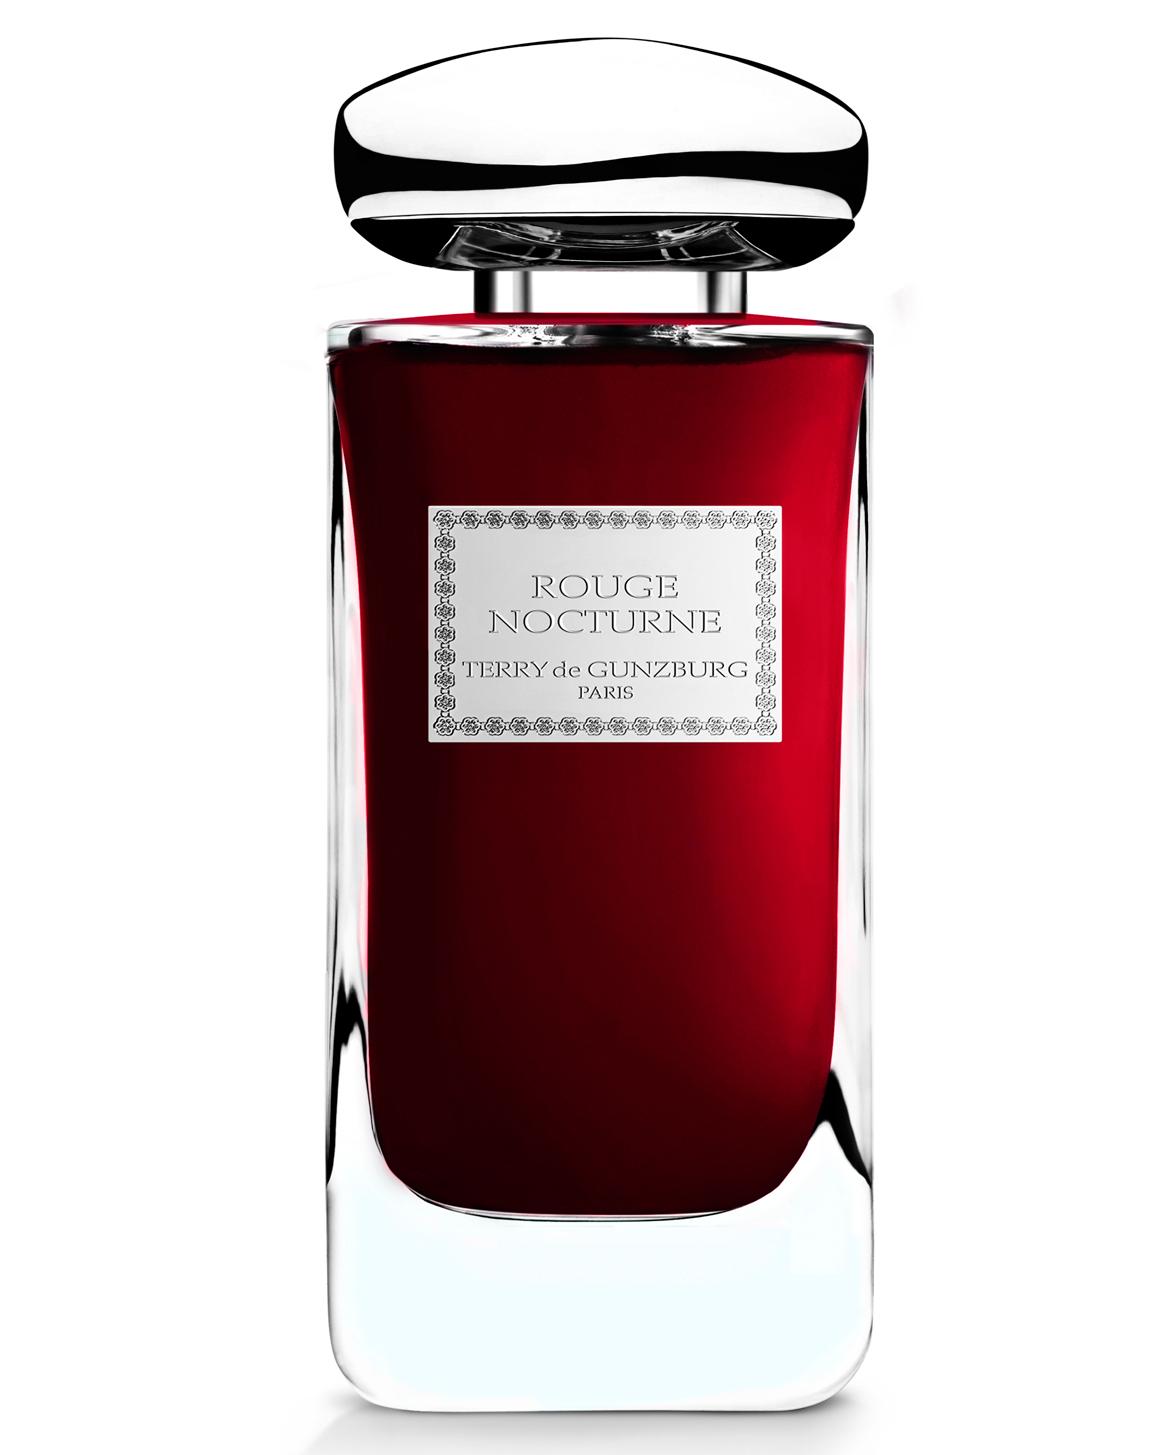 rose-perfume-terry-de-gunzburg-rouge-nocturne-0315.jpg